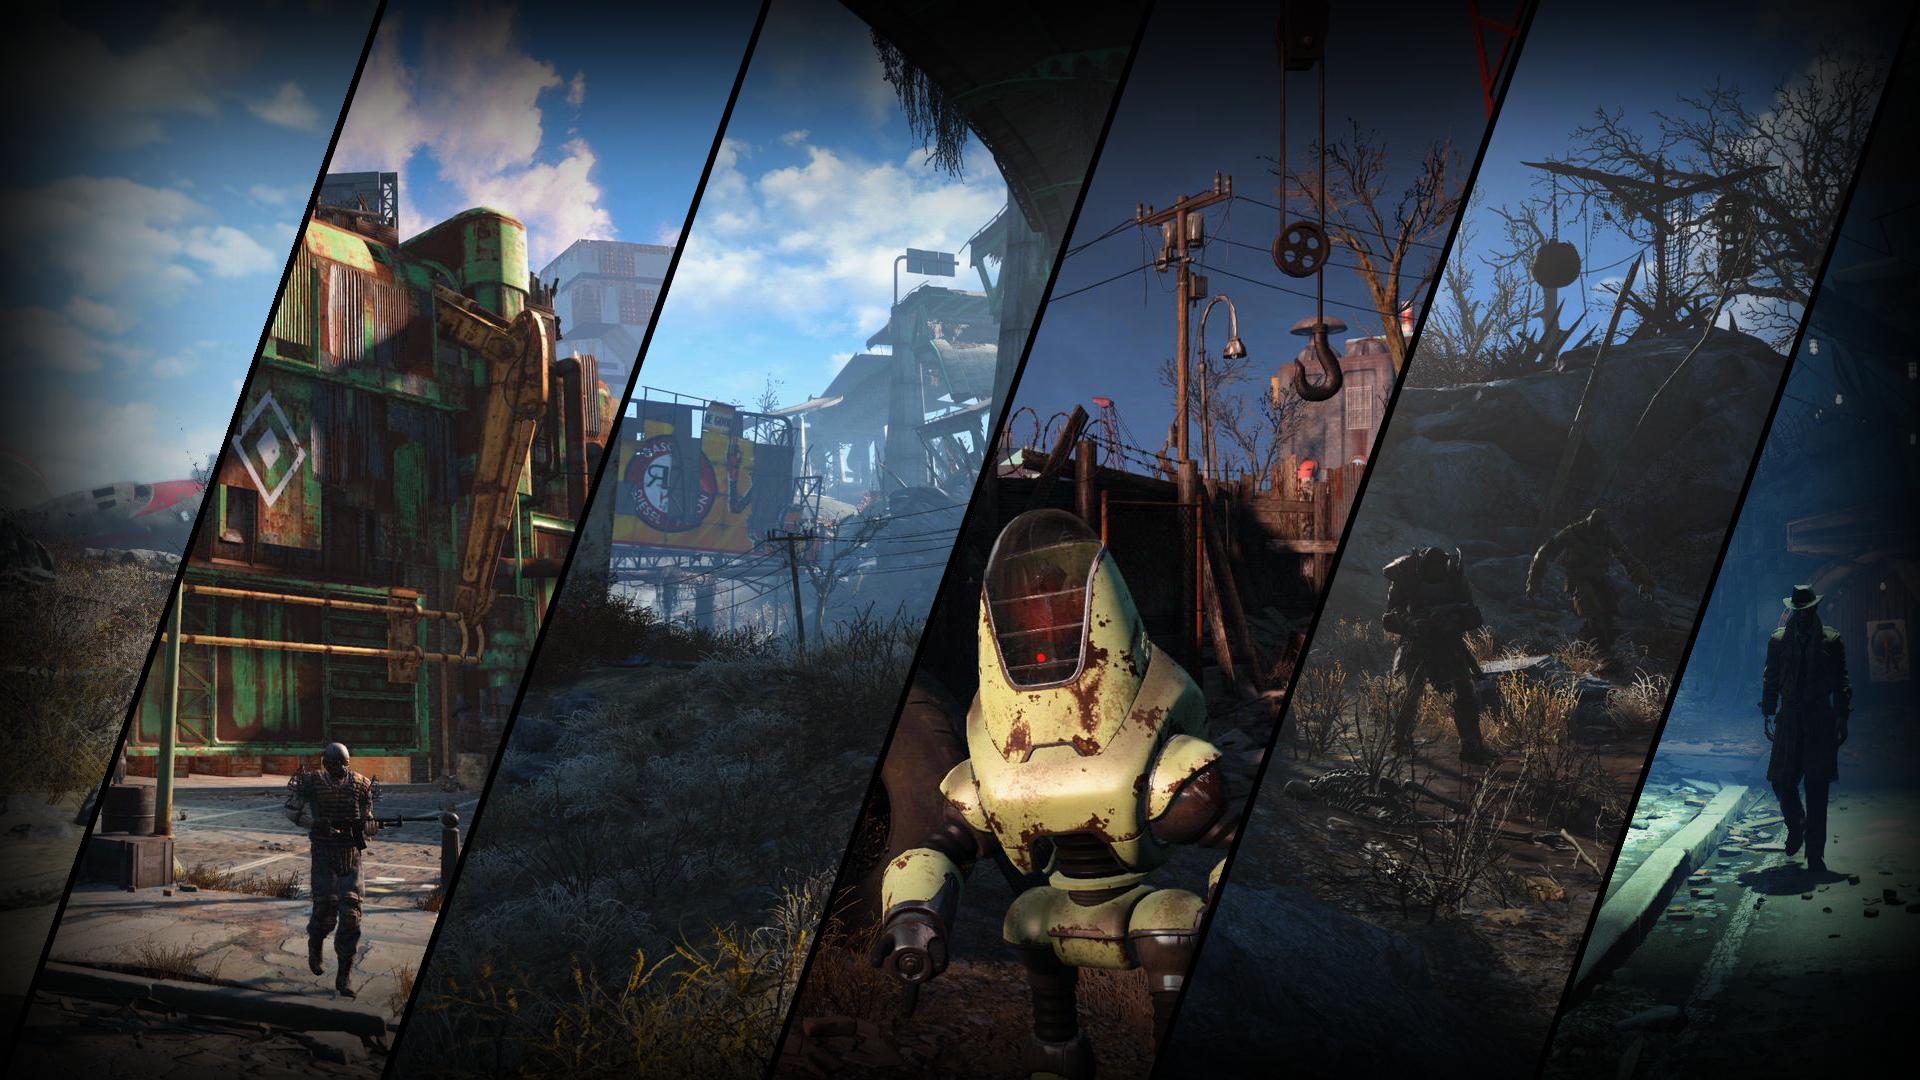 [50+] Wallpaper Of Fallout 4 On WallpaperSafari